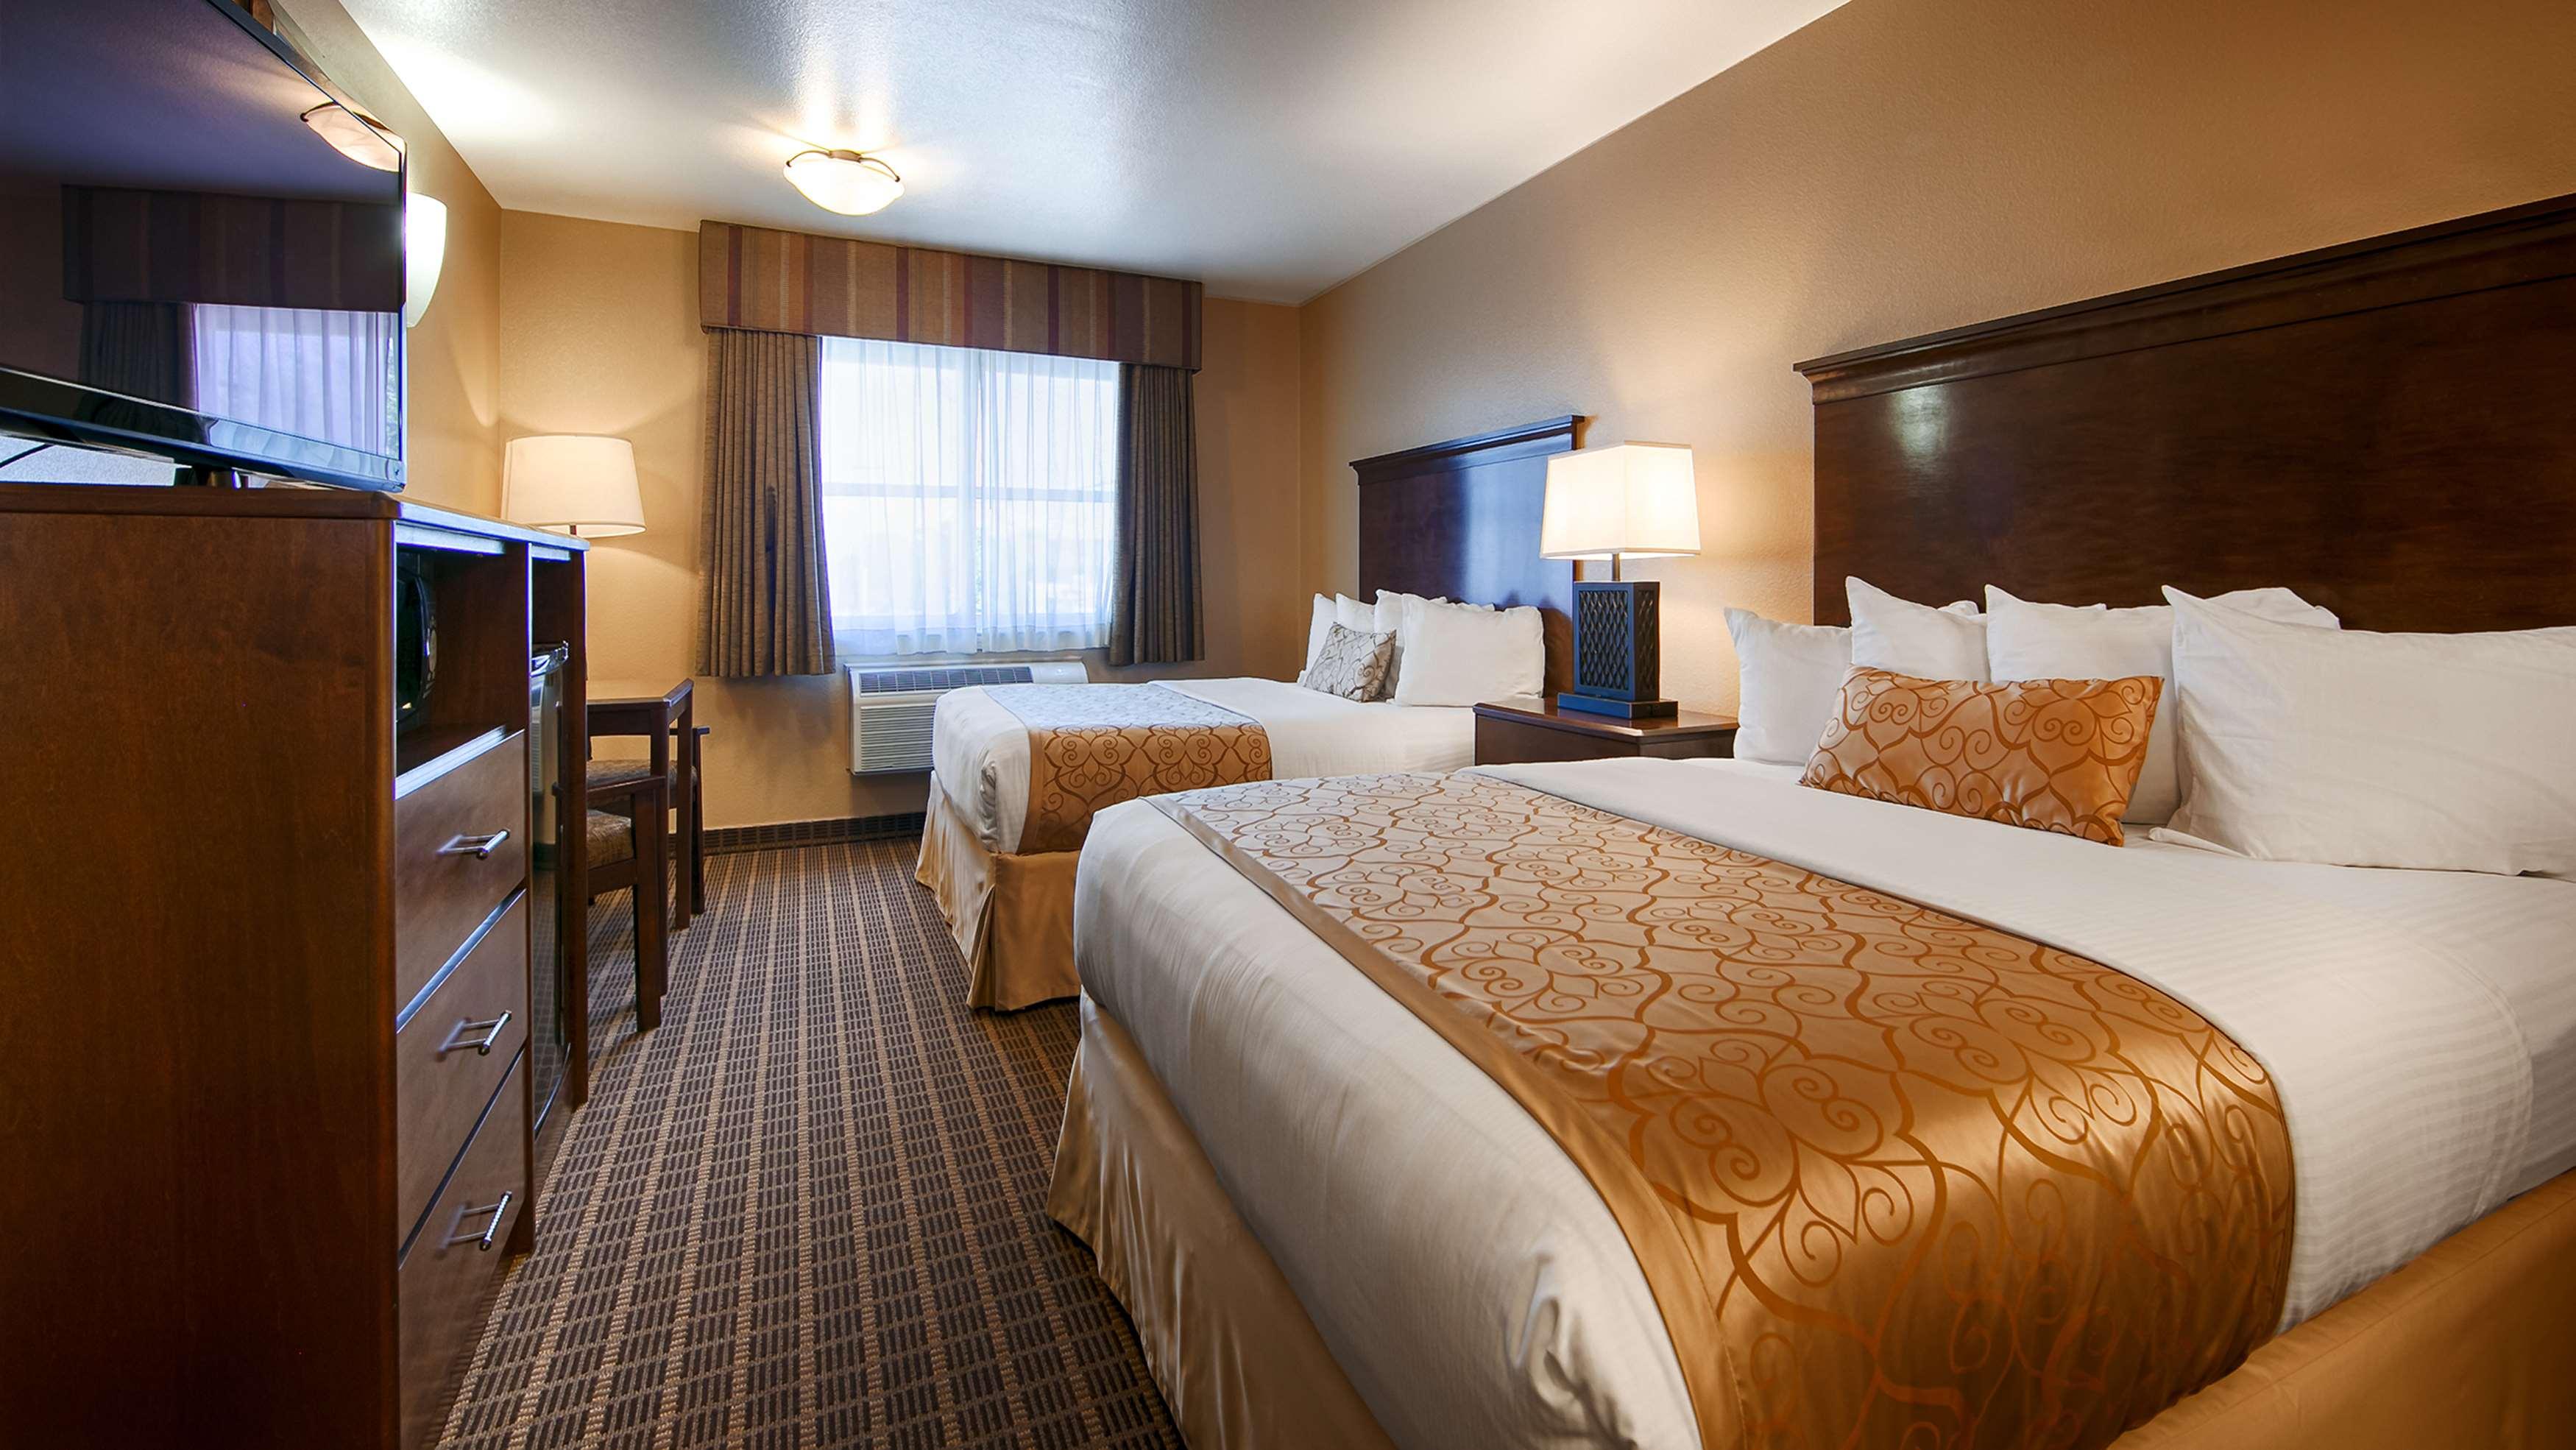 Best Western Fallon Inn & Suites image 13